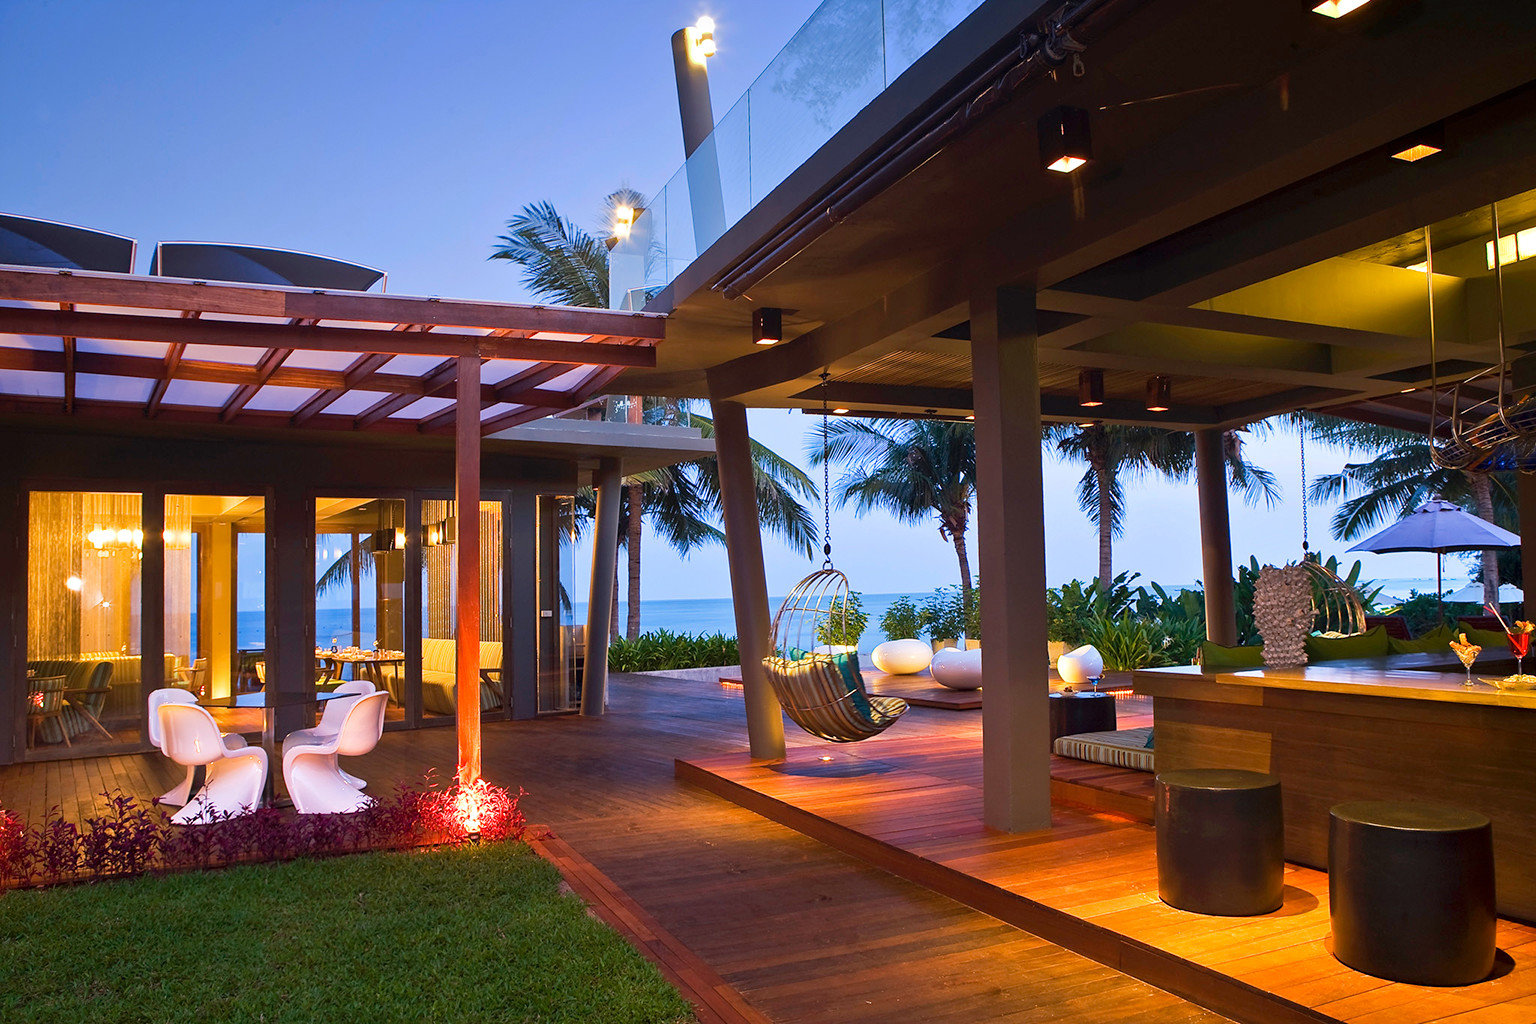 Beach Dining Family Grounds Modern Resort sky leisure building home restaurant Villa hacienda